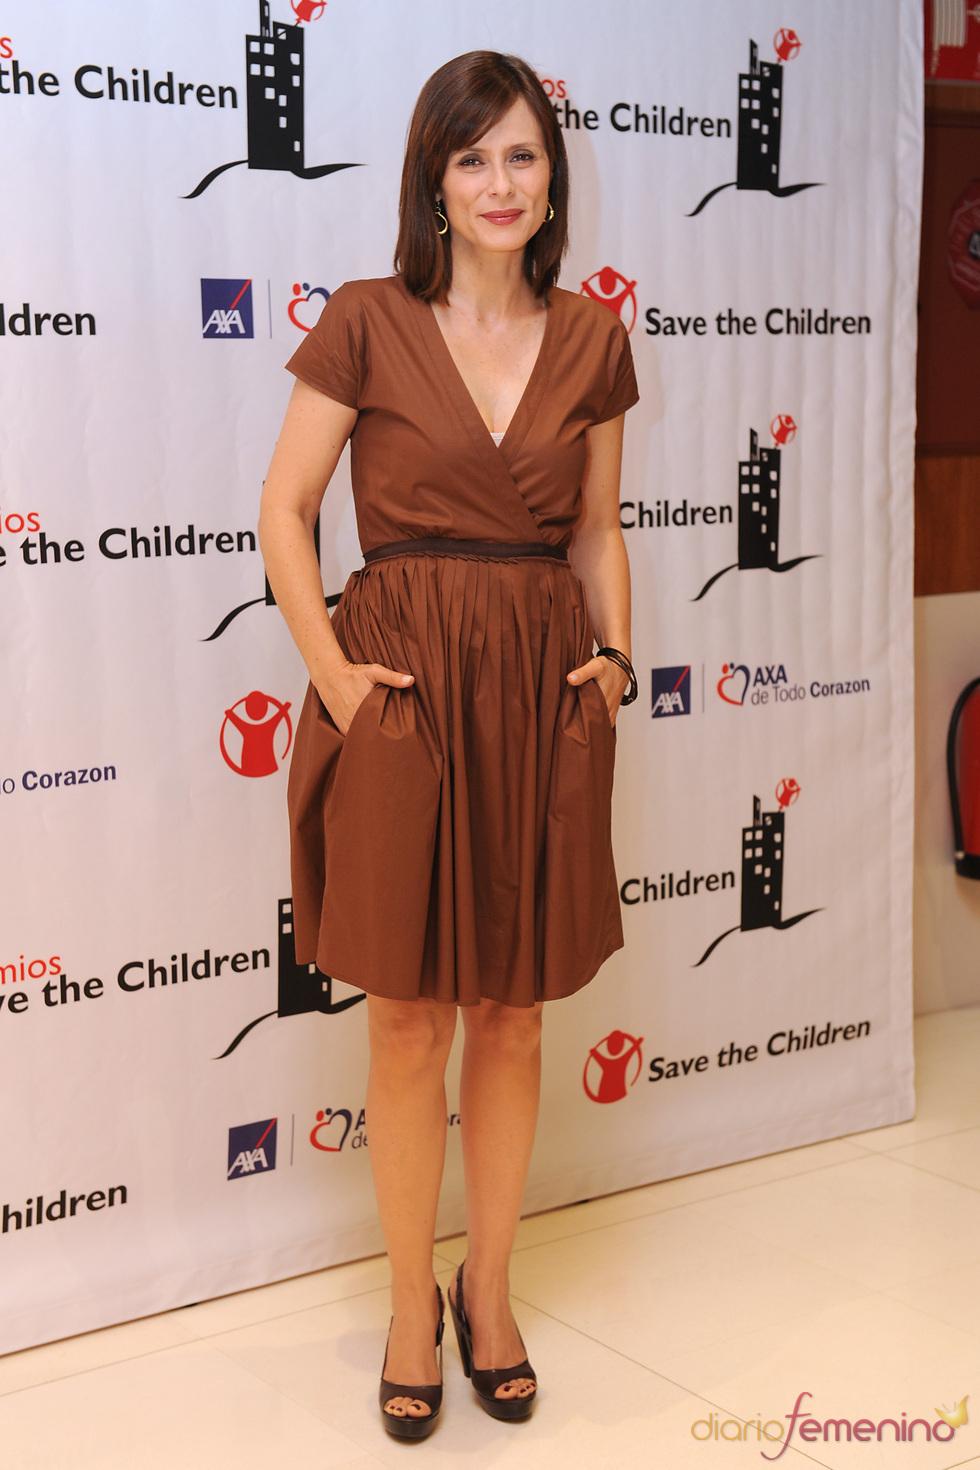 Aitana Sánchez Gijón en los premios Save the children 2011